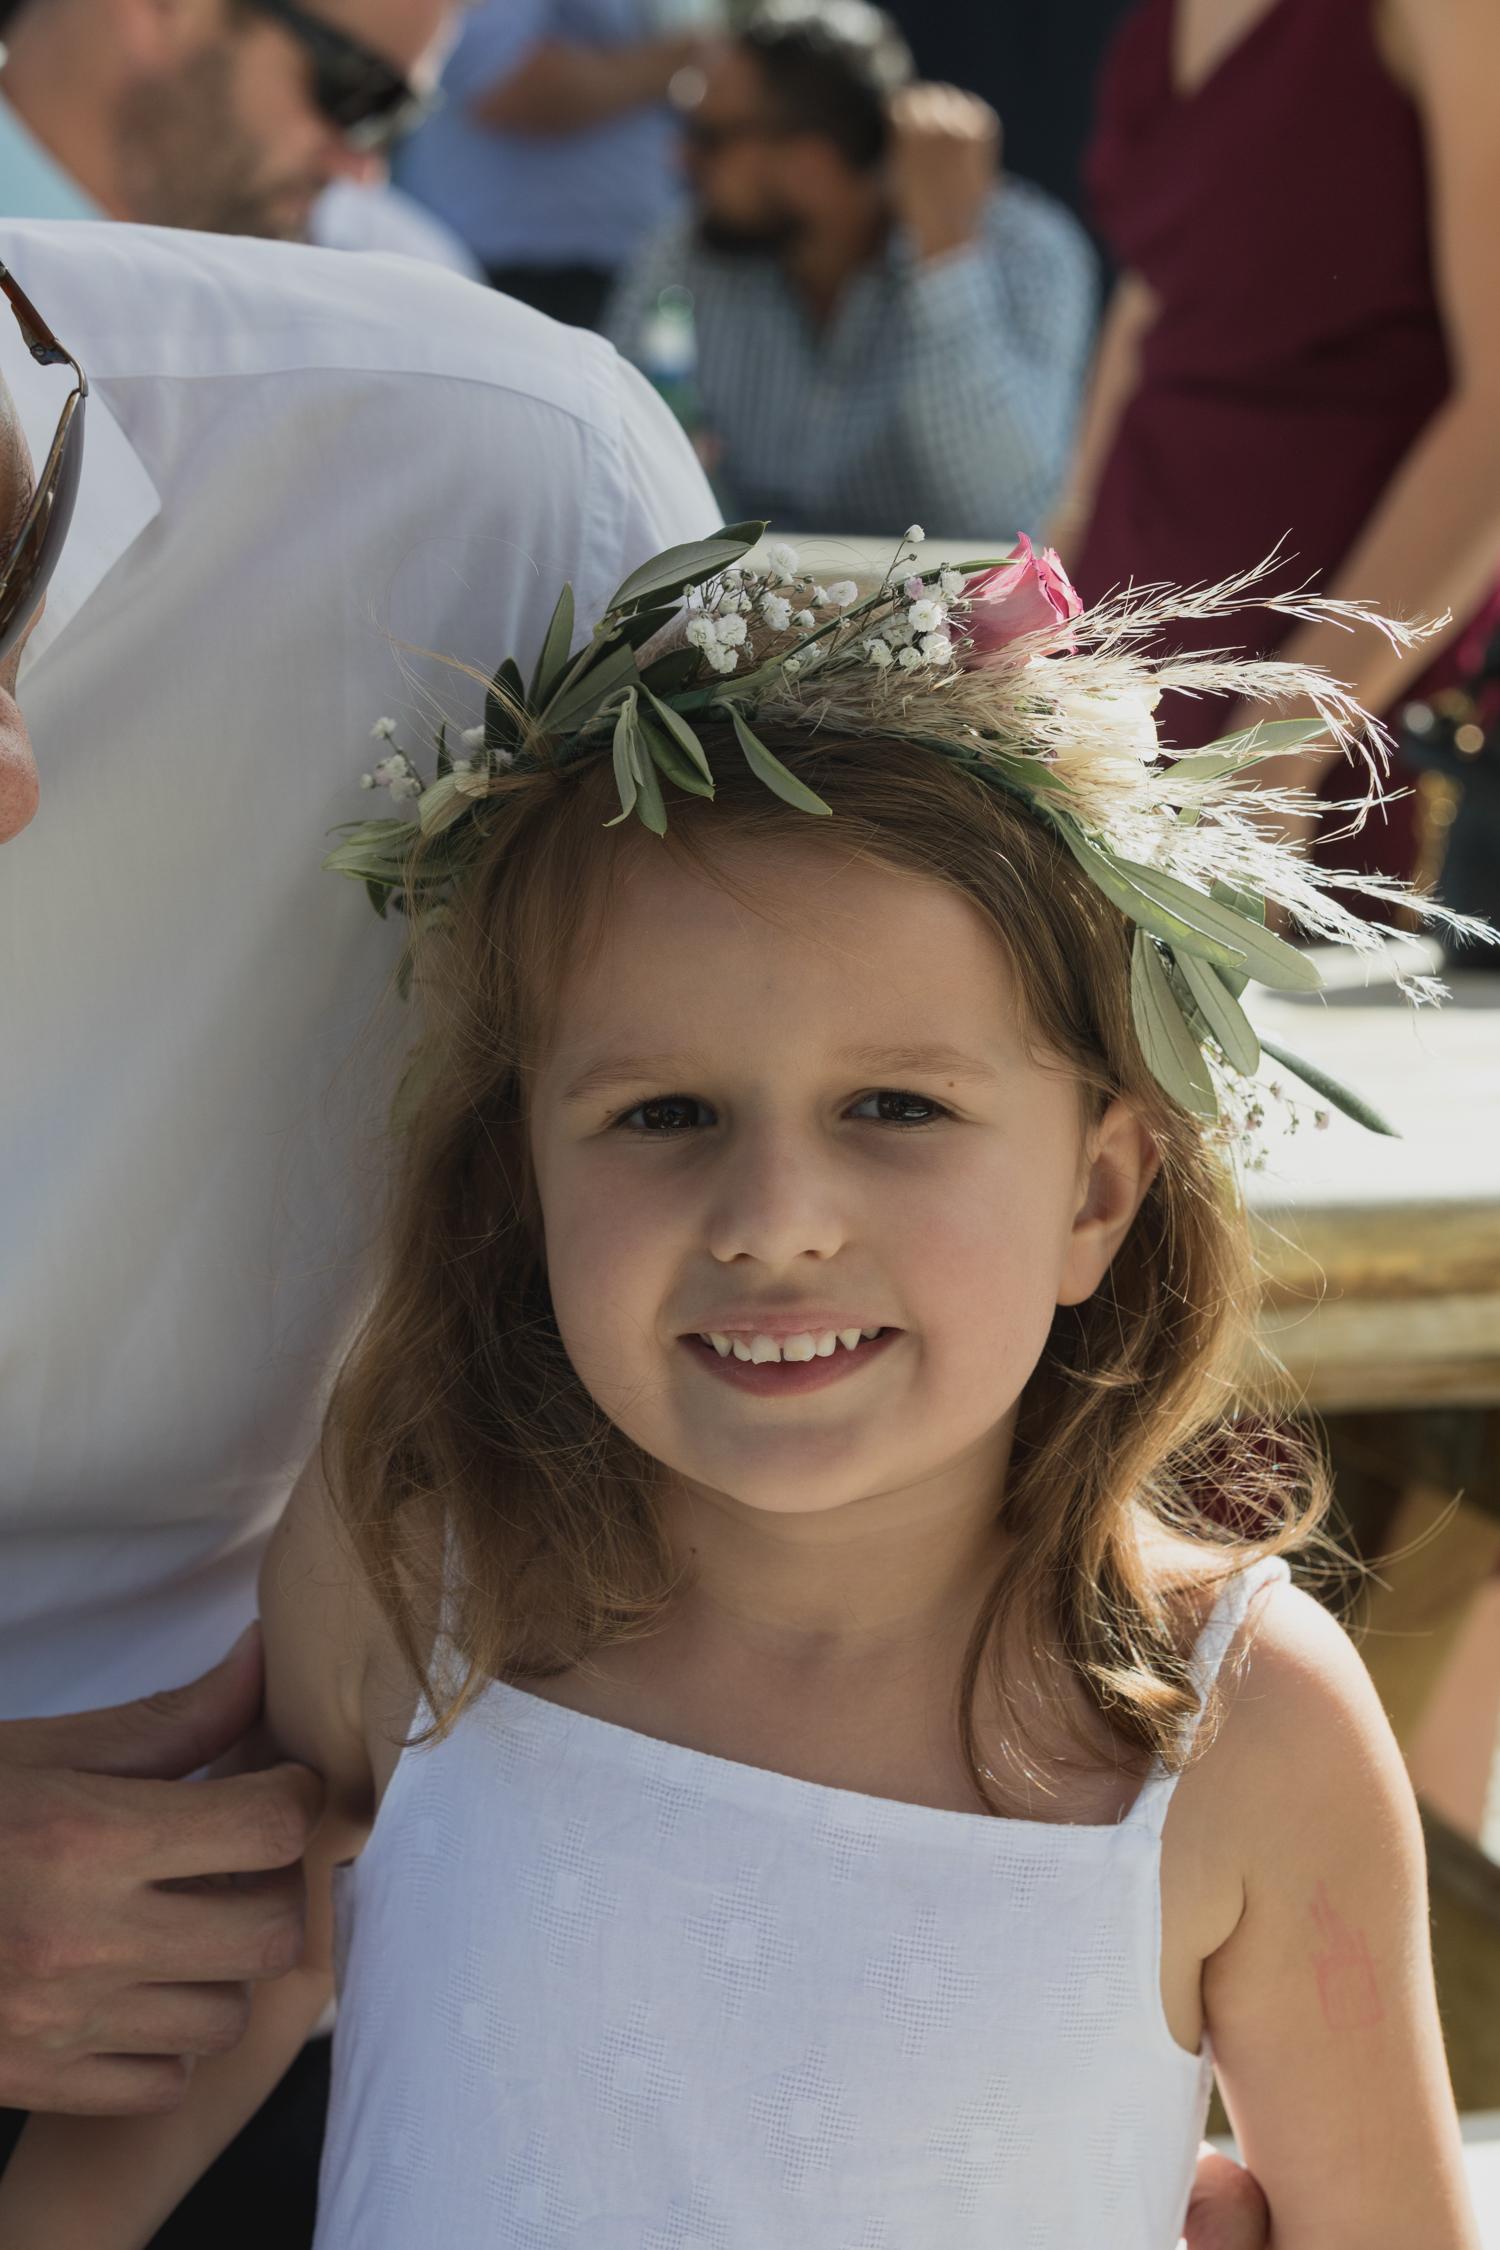 wedding-at-the-red-barn-new-zealand-wedding-photographer-flower-girl-wearing-flower-crown.jpg